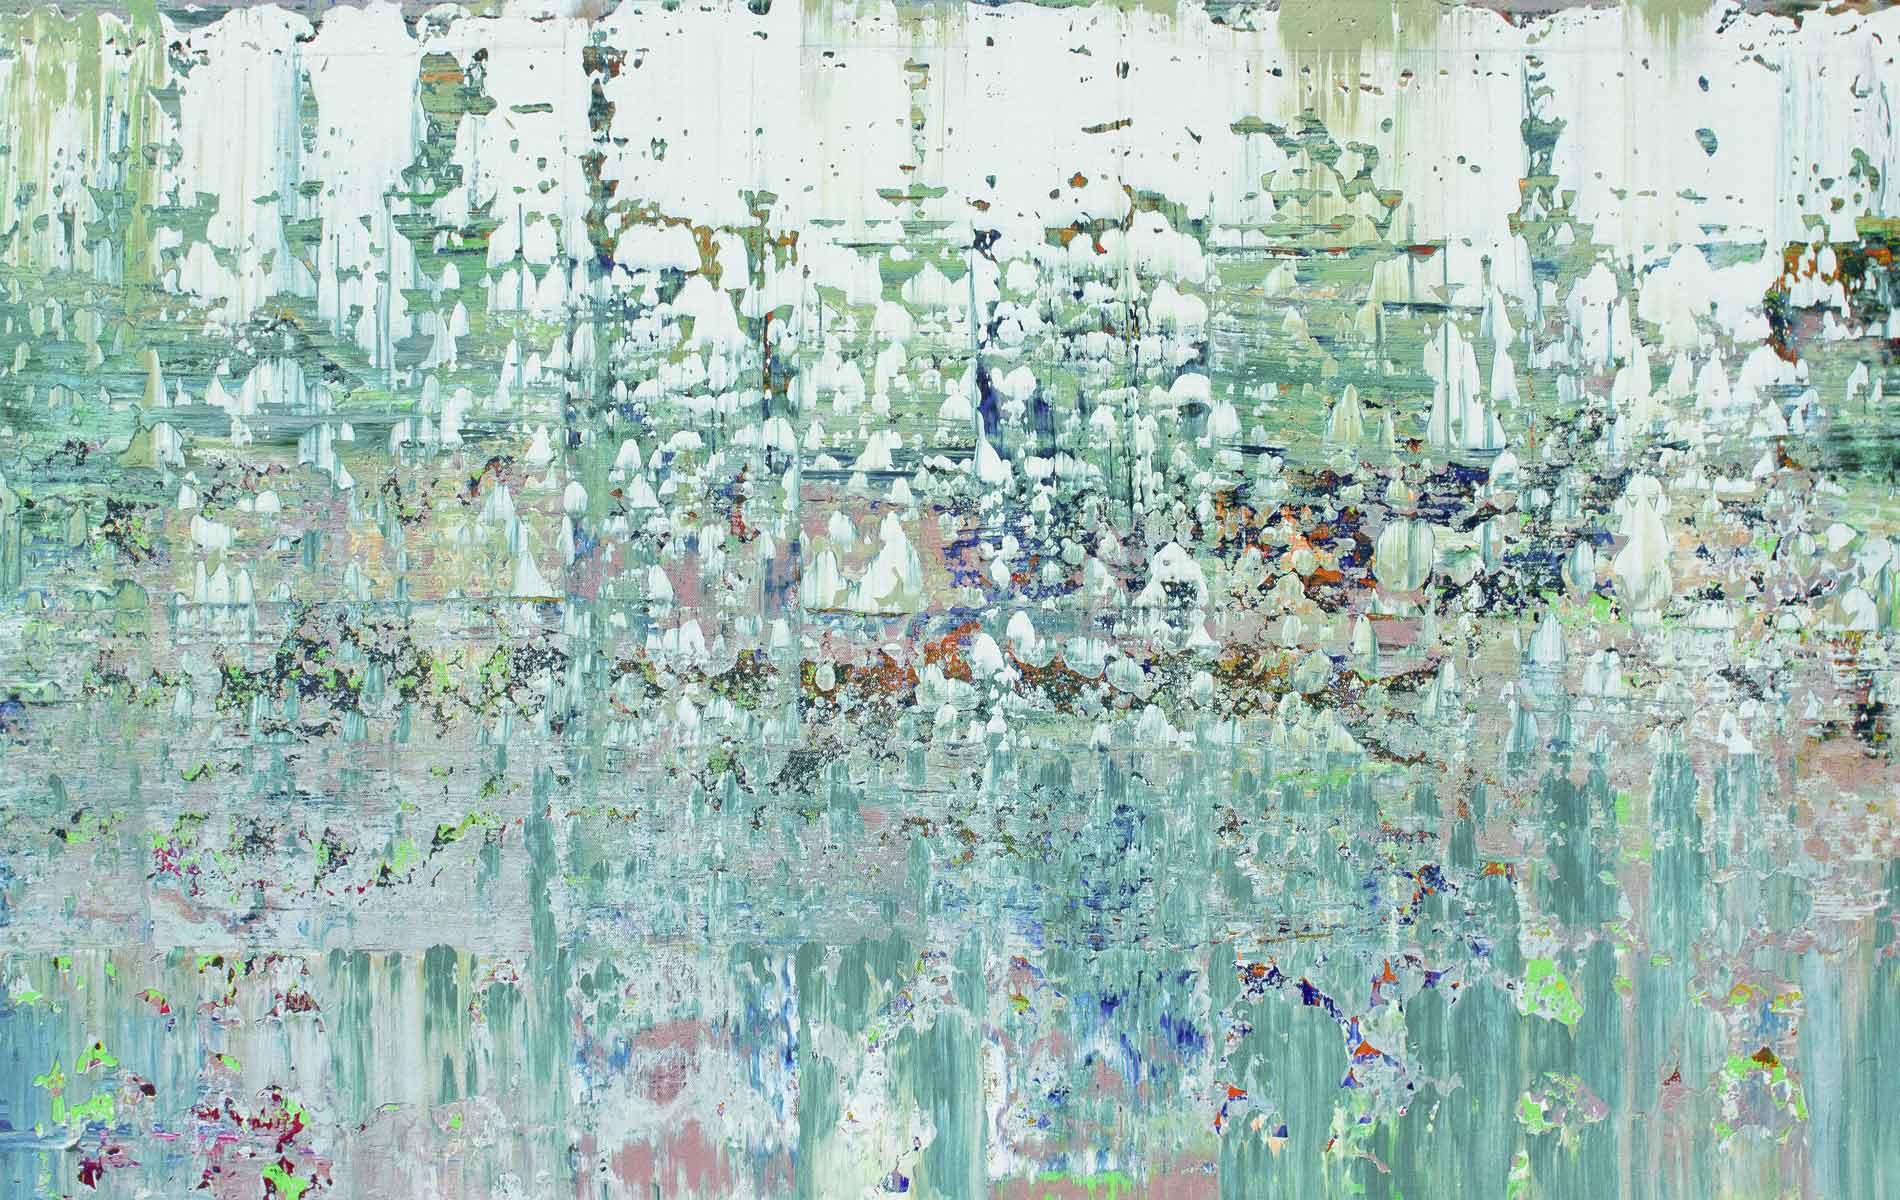 Horizon, 2014, Acrylic on Canvas, 42 x 64